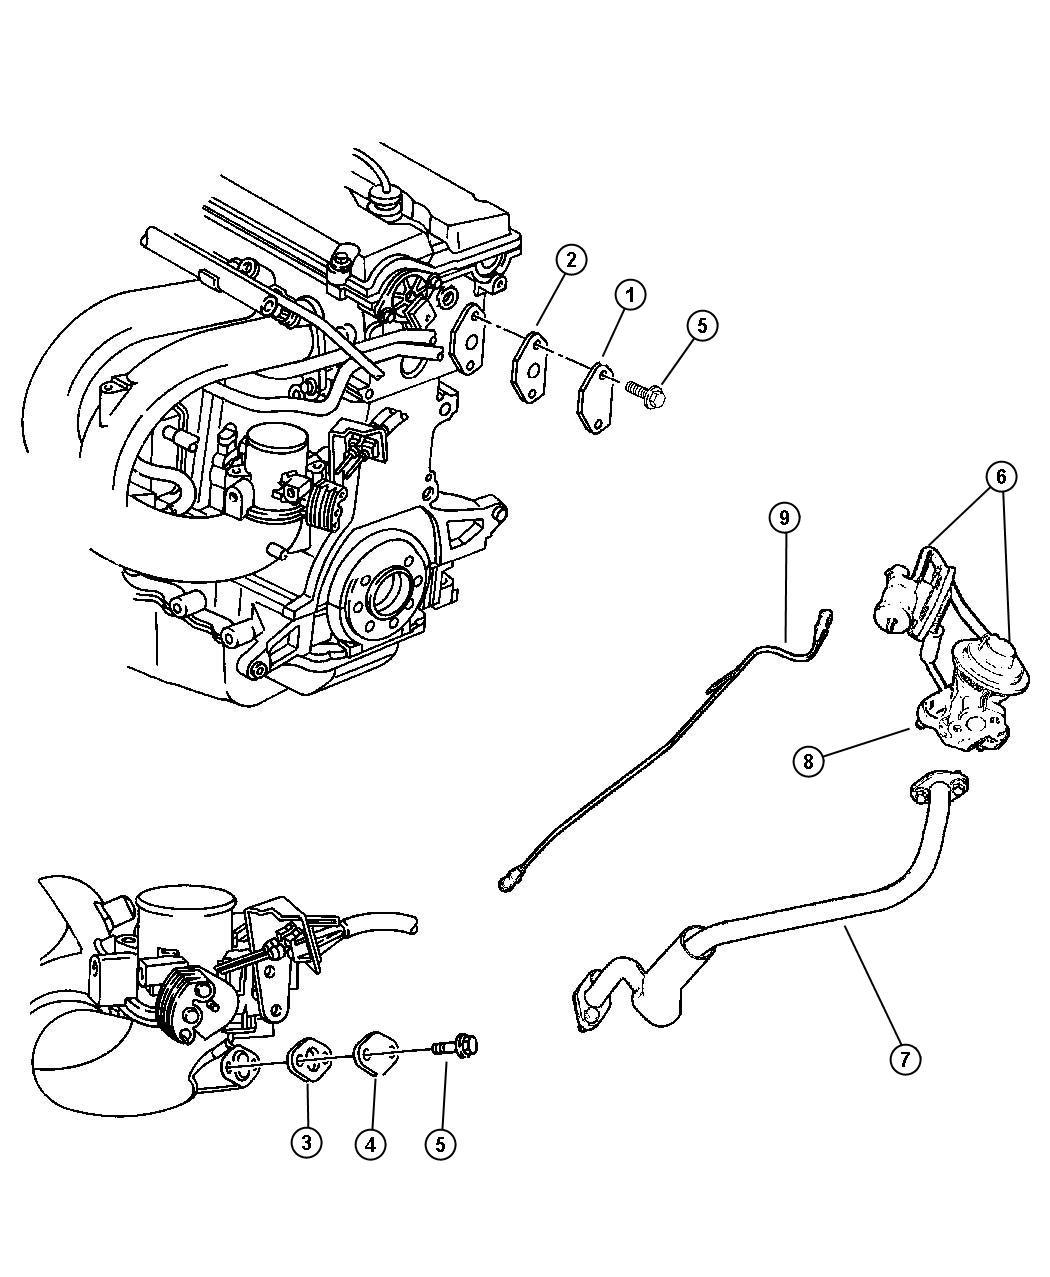 Dodge Caravan Egr System 2 4l Edz Engine